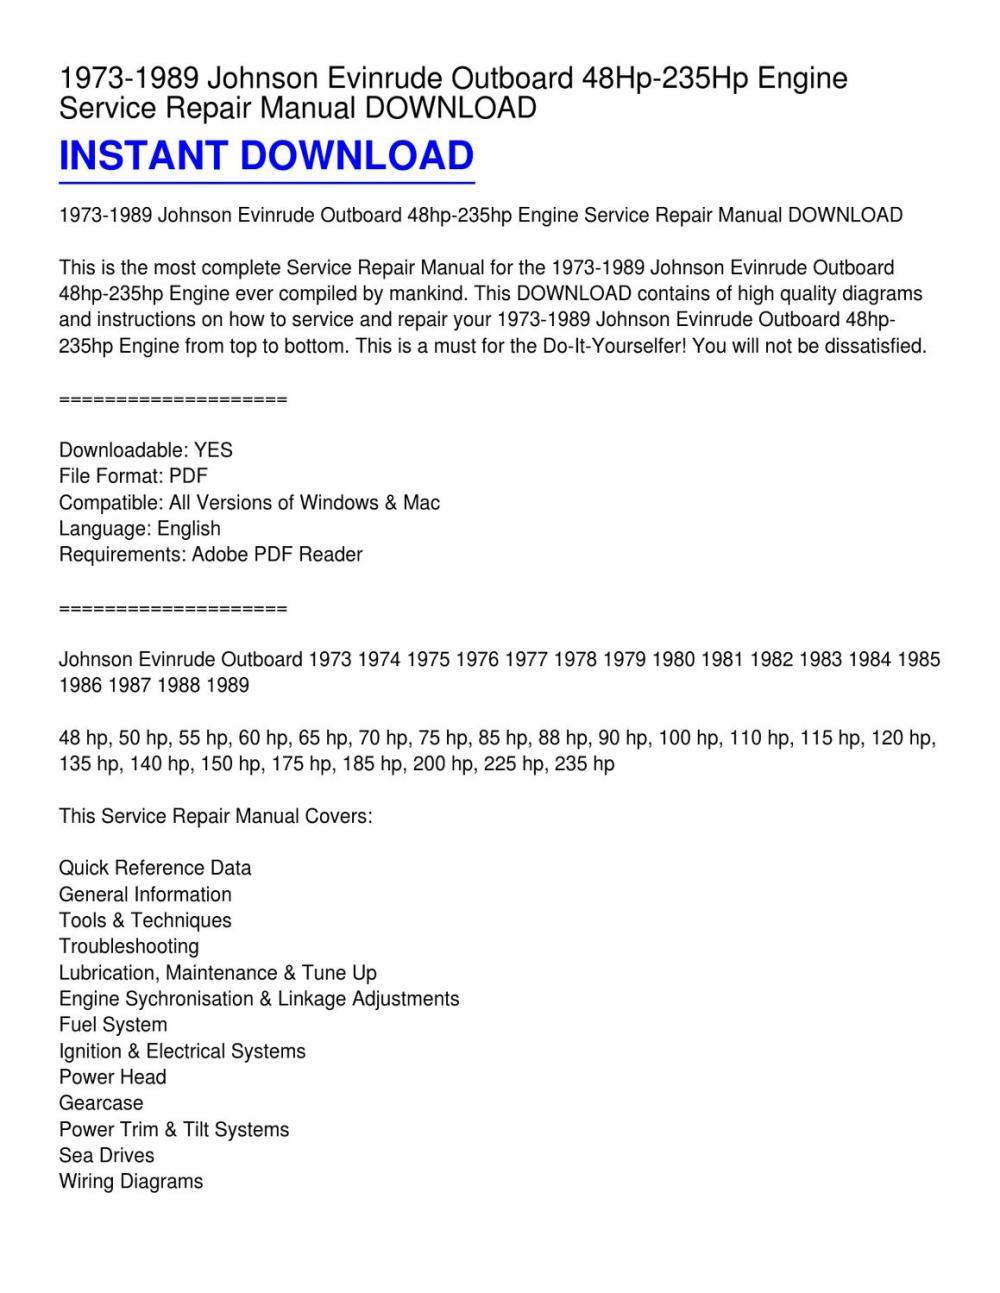 medium resolution of 1973 1989 johnson evinrude outboard 48hp 235hp engine service repair manual download